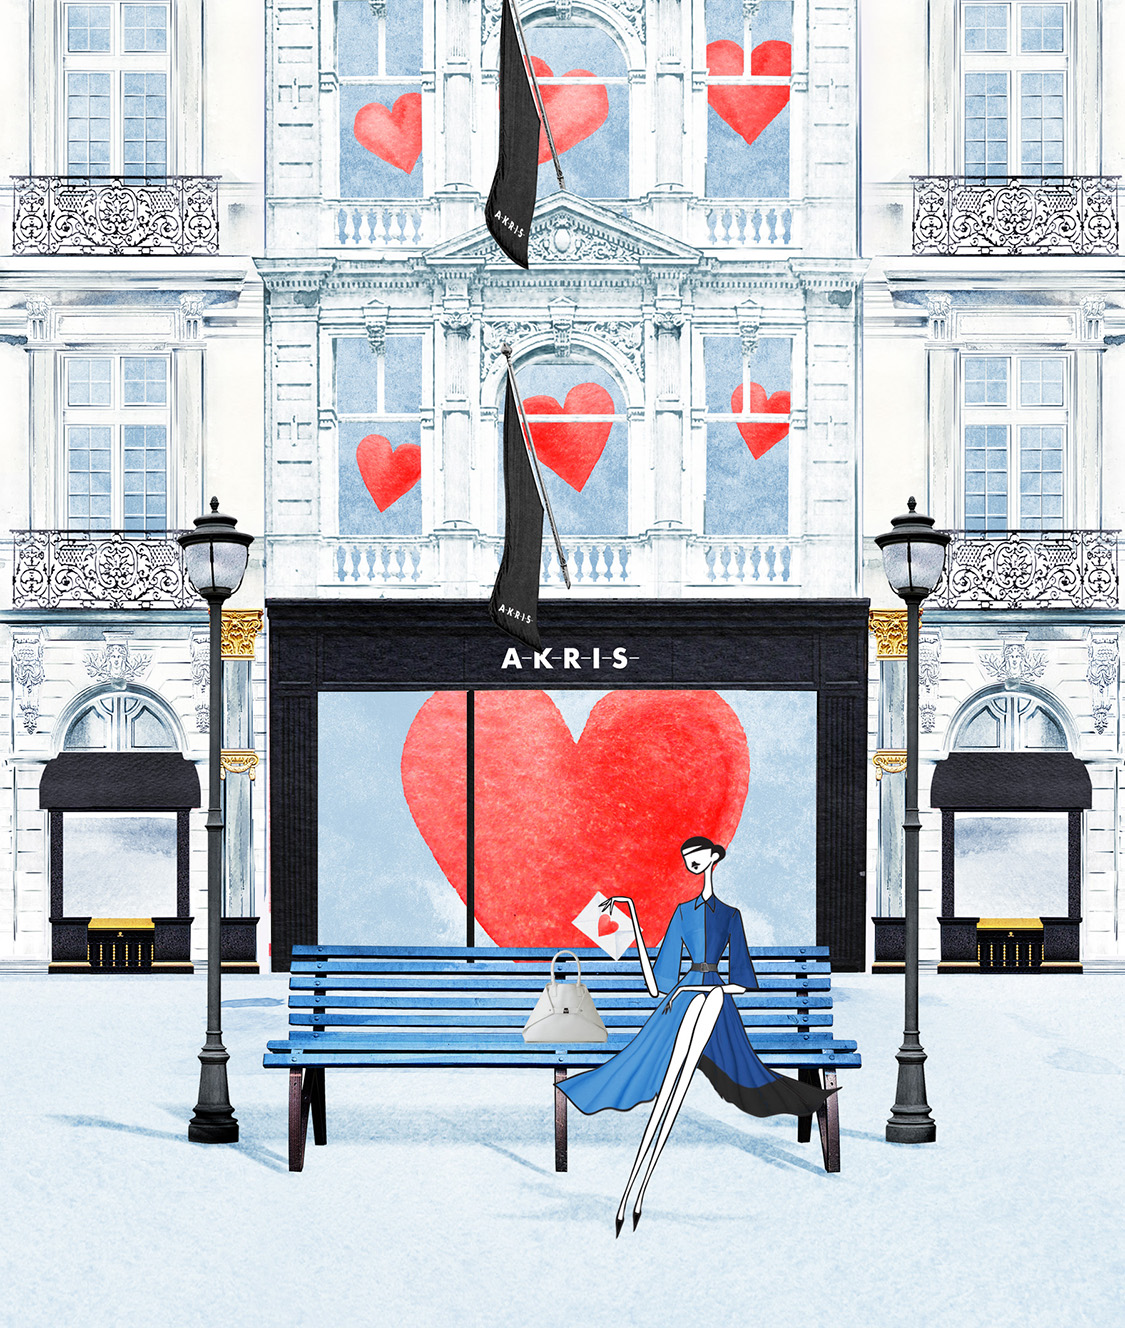 Akris Valentine's day Illustration